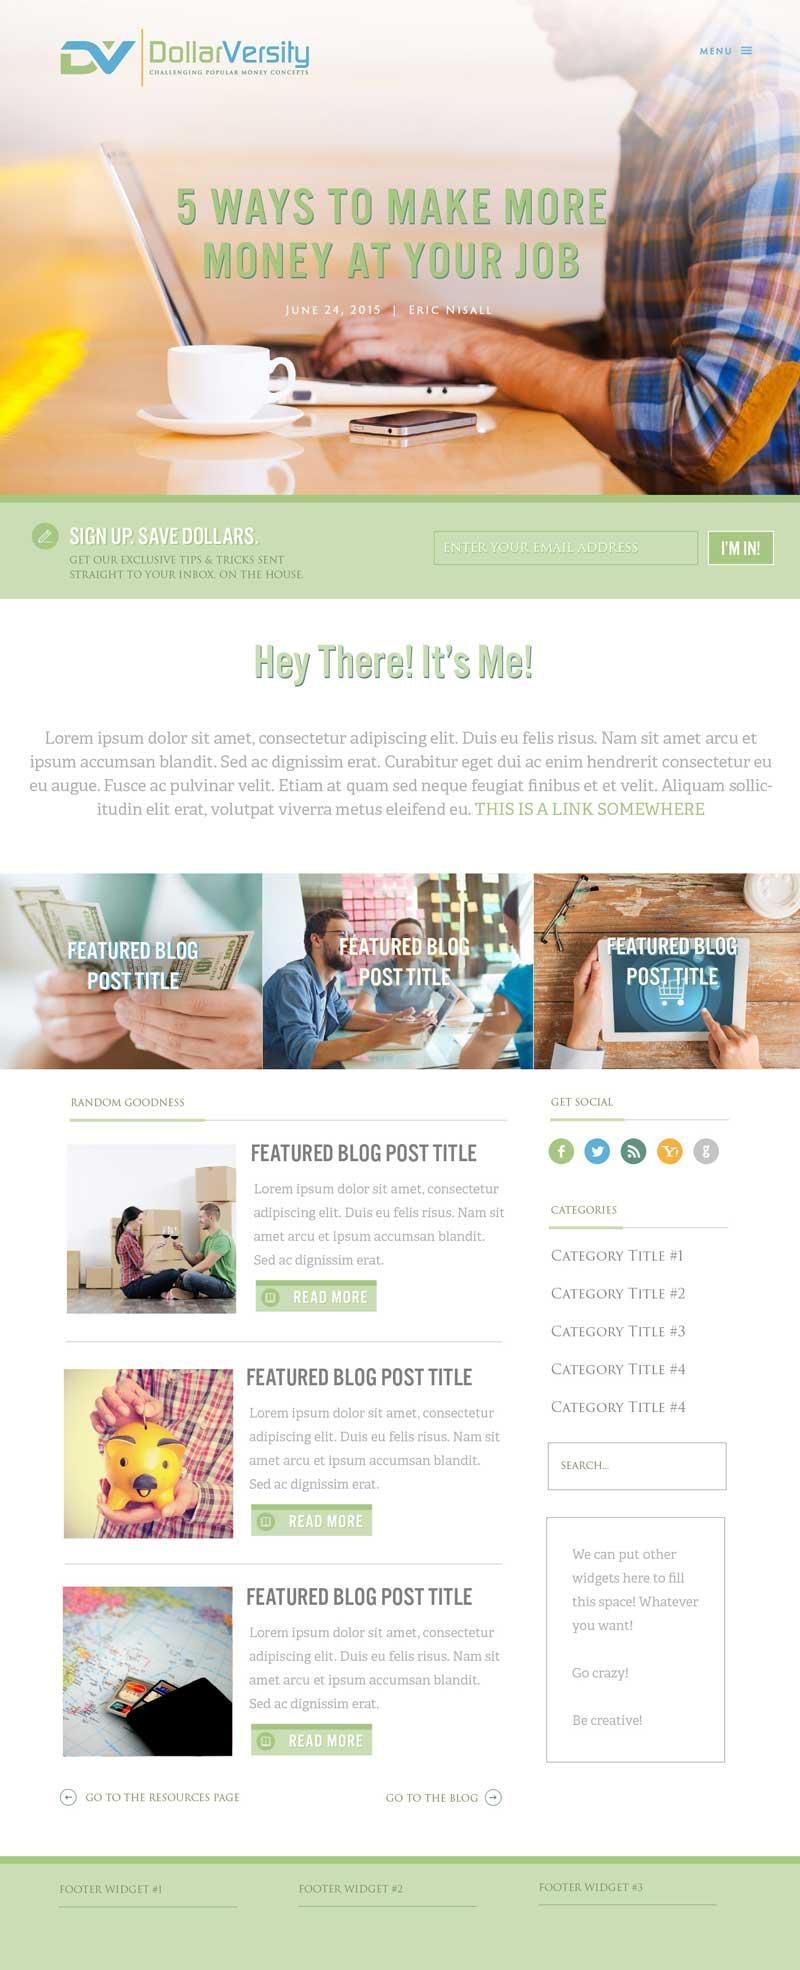 DollarVersity WordPress Web Design RKA ink